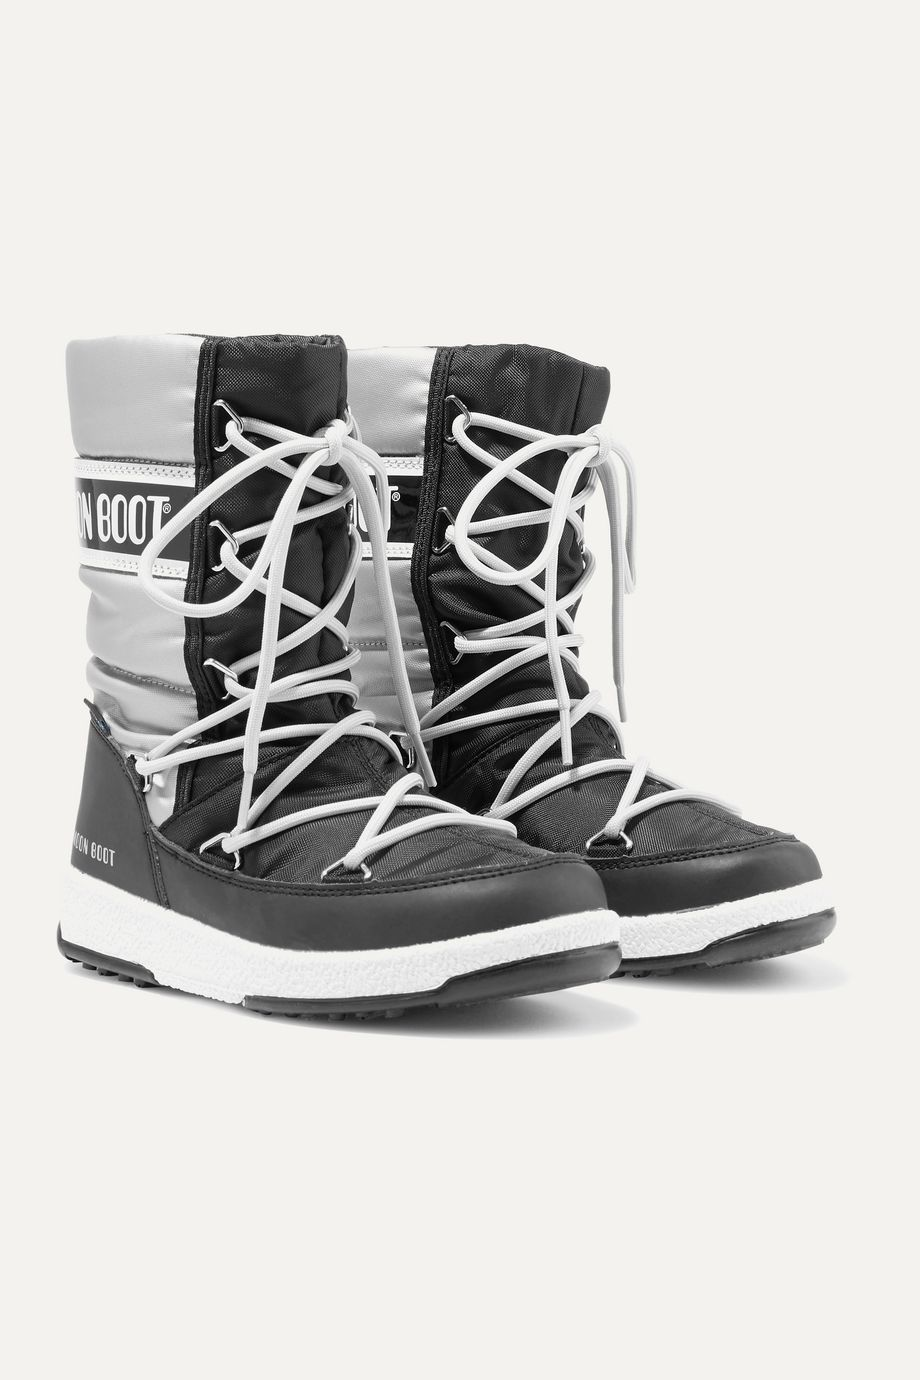 Moon Boot Kids 【 2 - 14 岁】双色软壳面料漆光面料人造皮革雪地靴